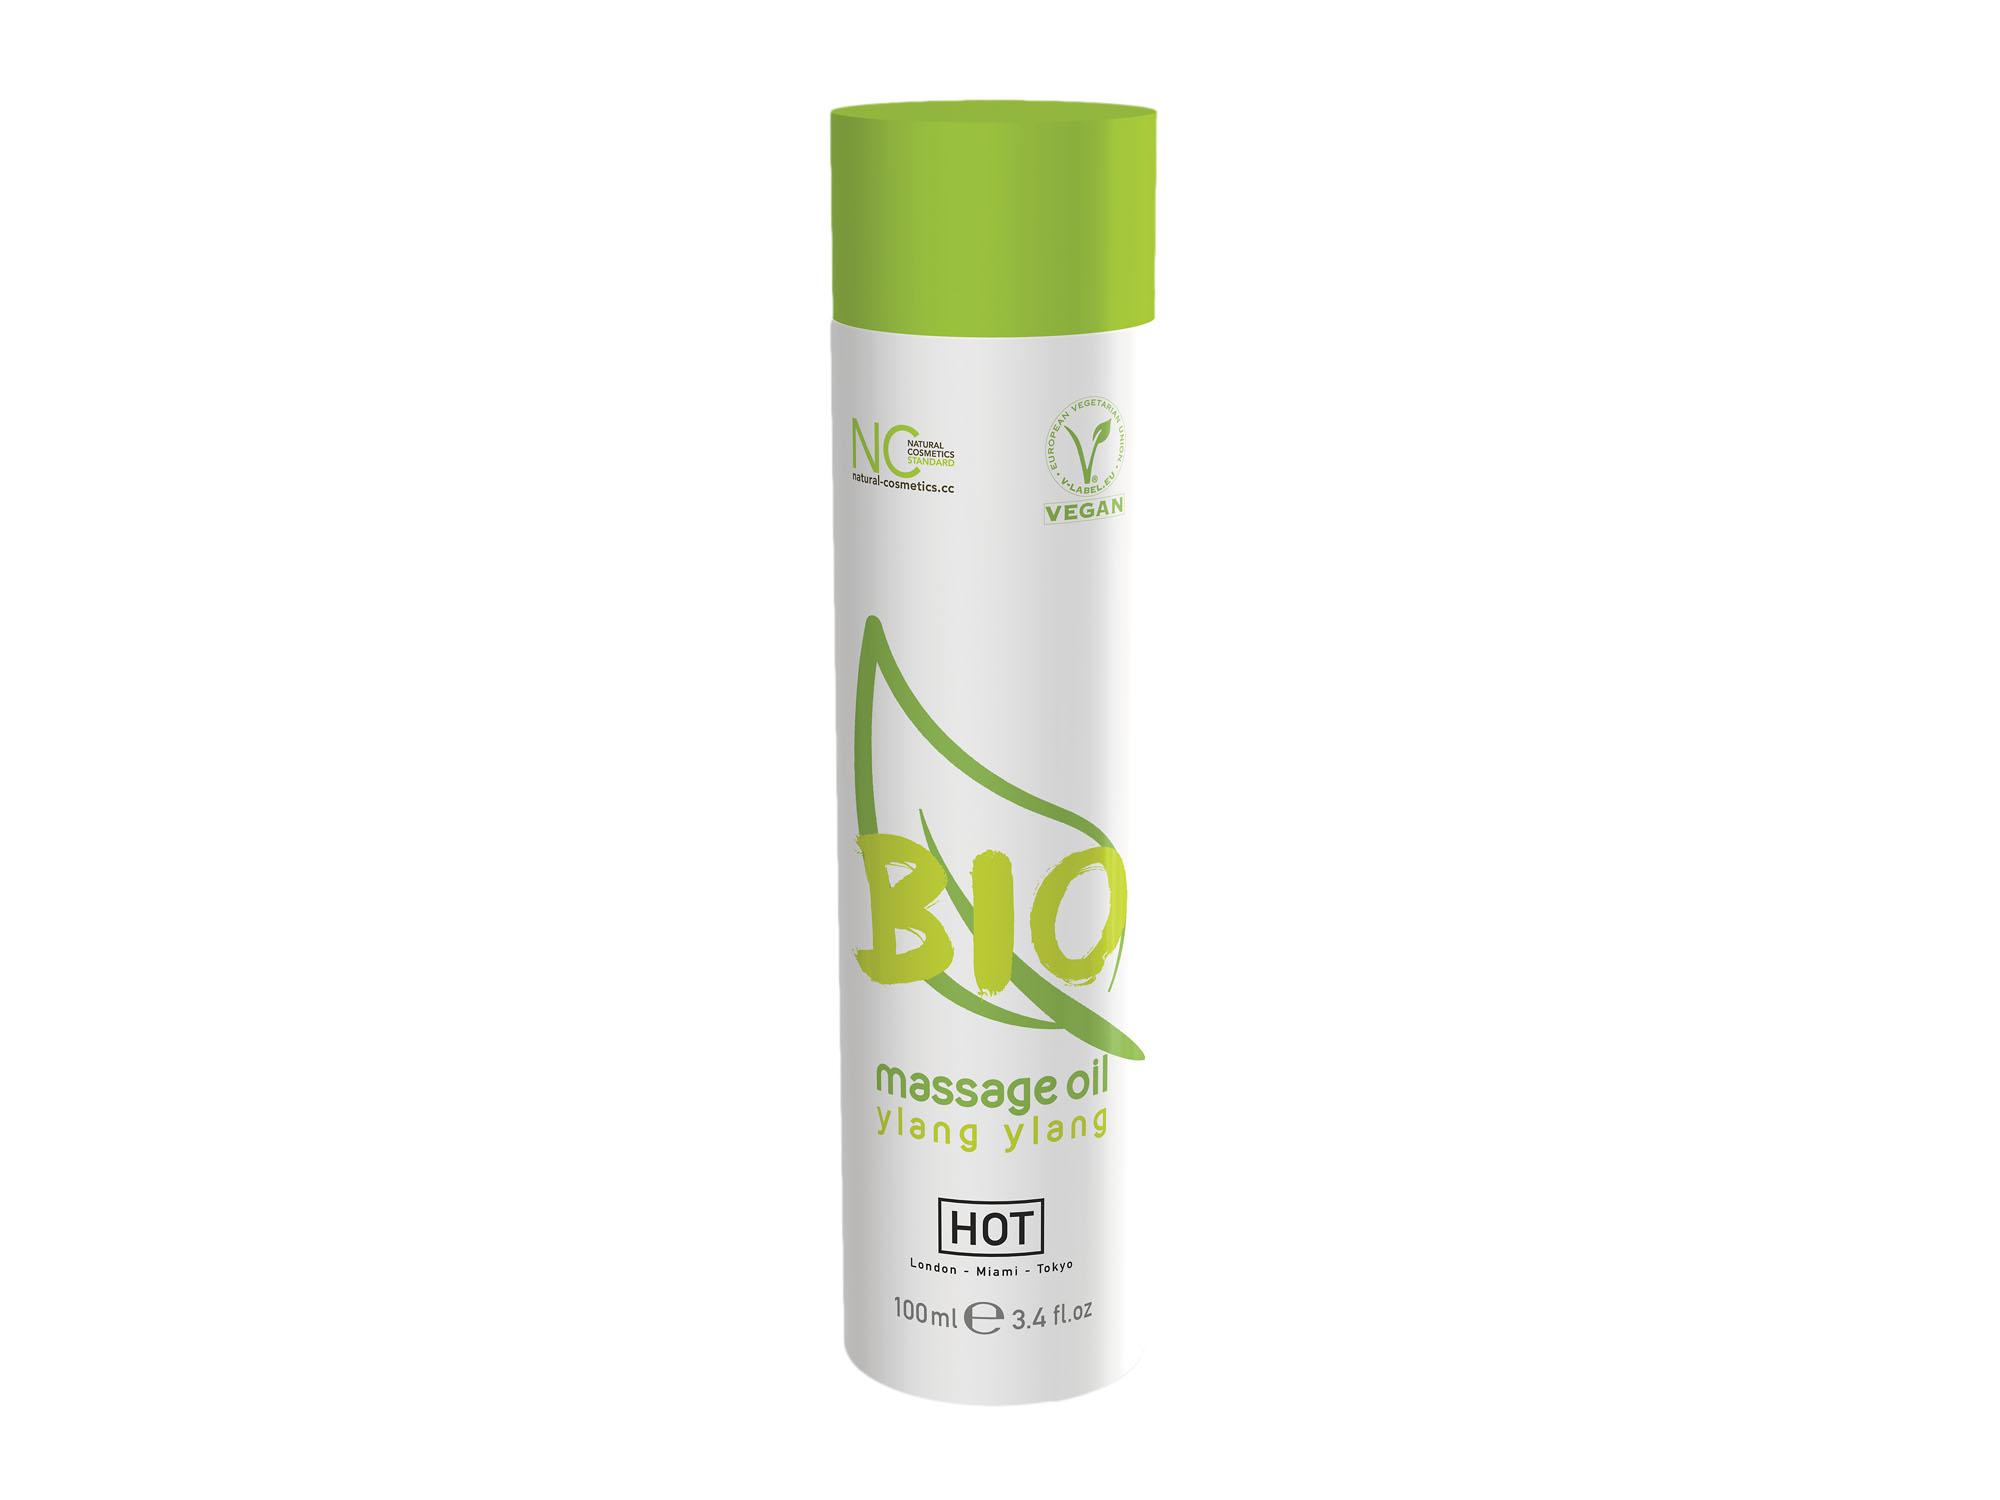 BIO Massageöl  Ylang-Ylang, vegan 100ml